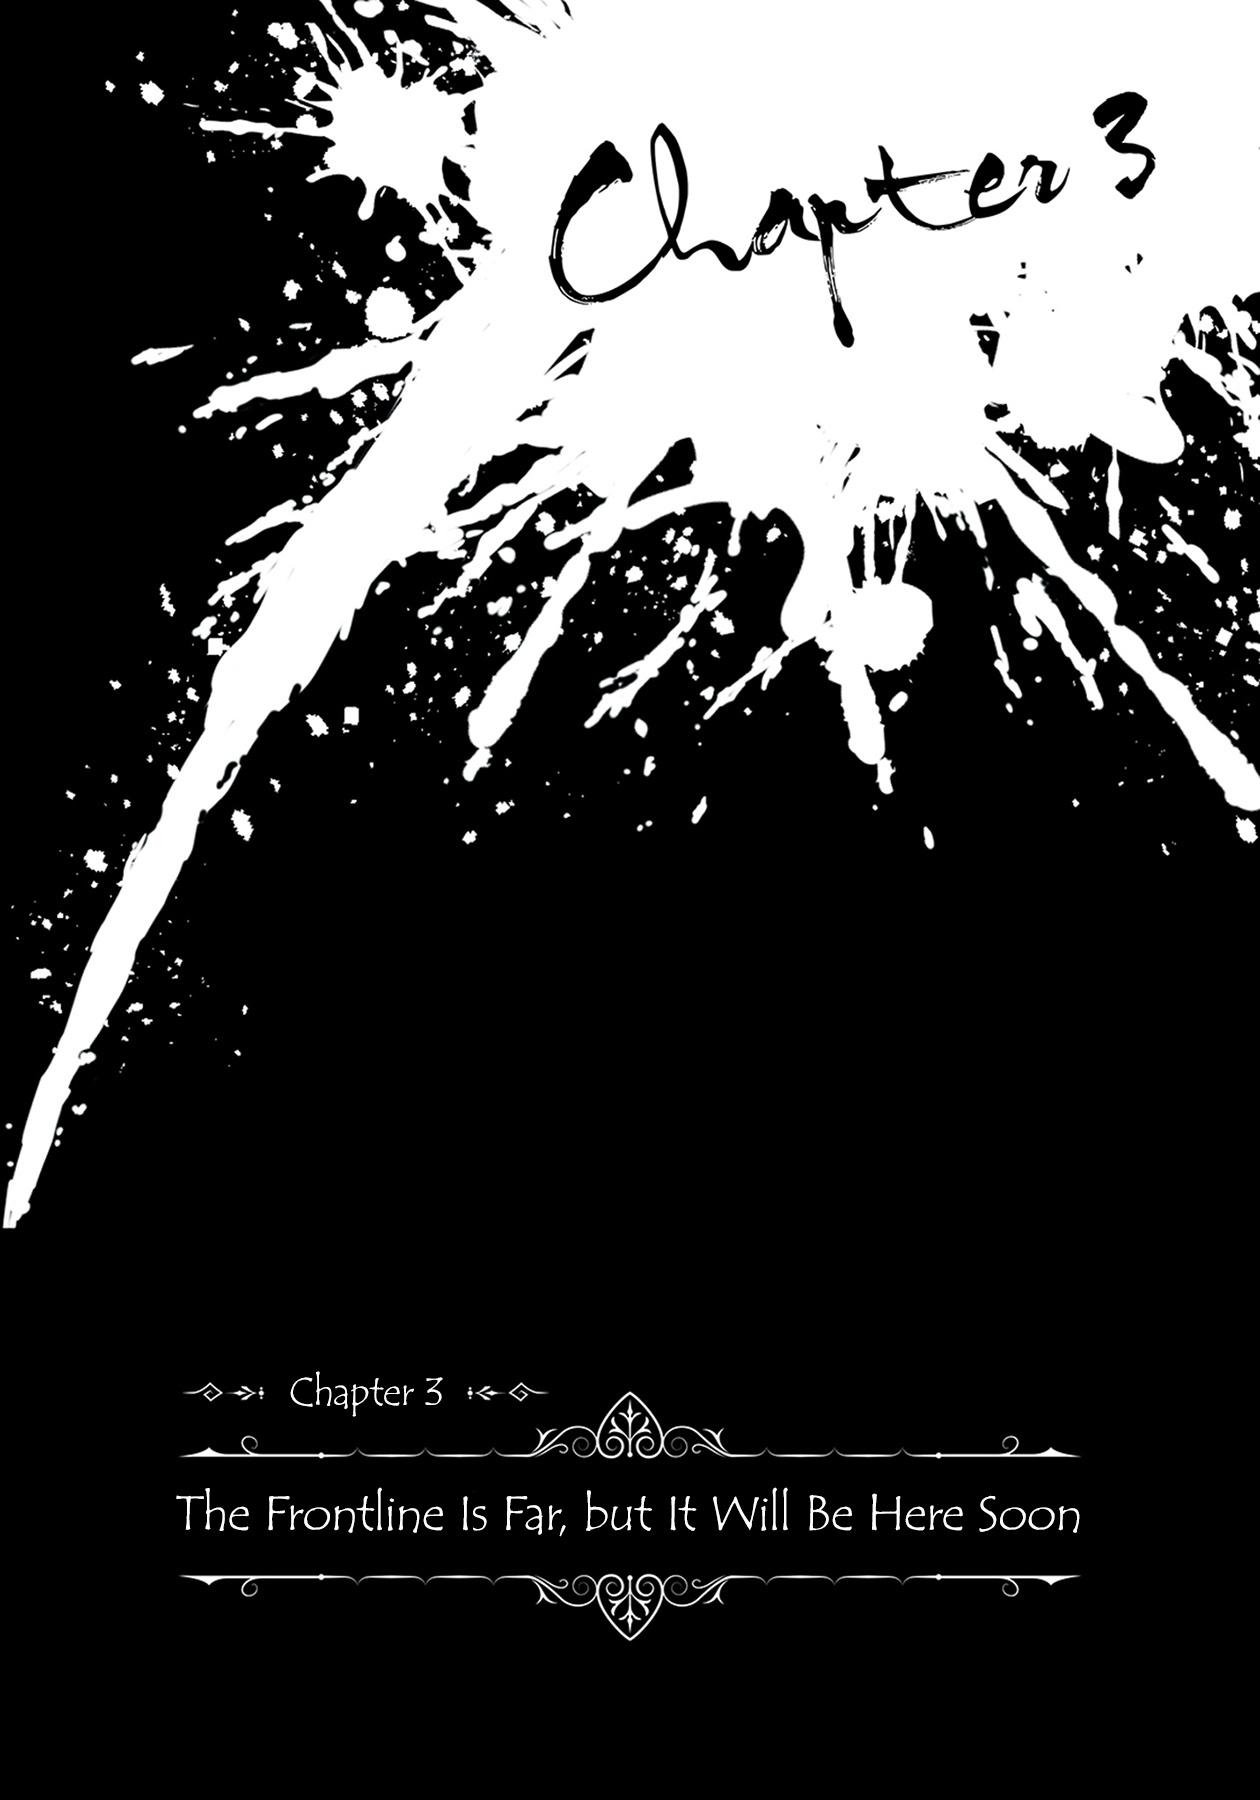 Elvenblood - Vol 1 Chapter 3